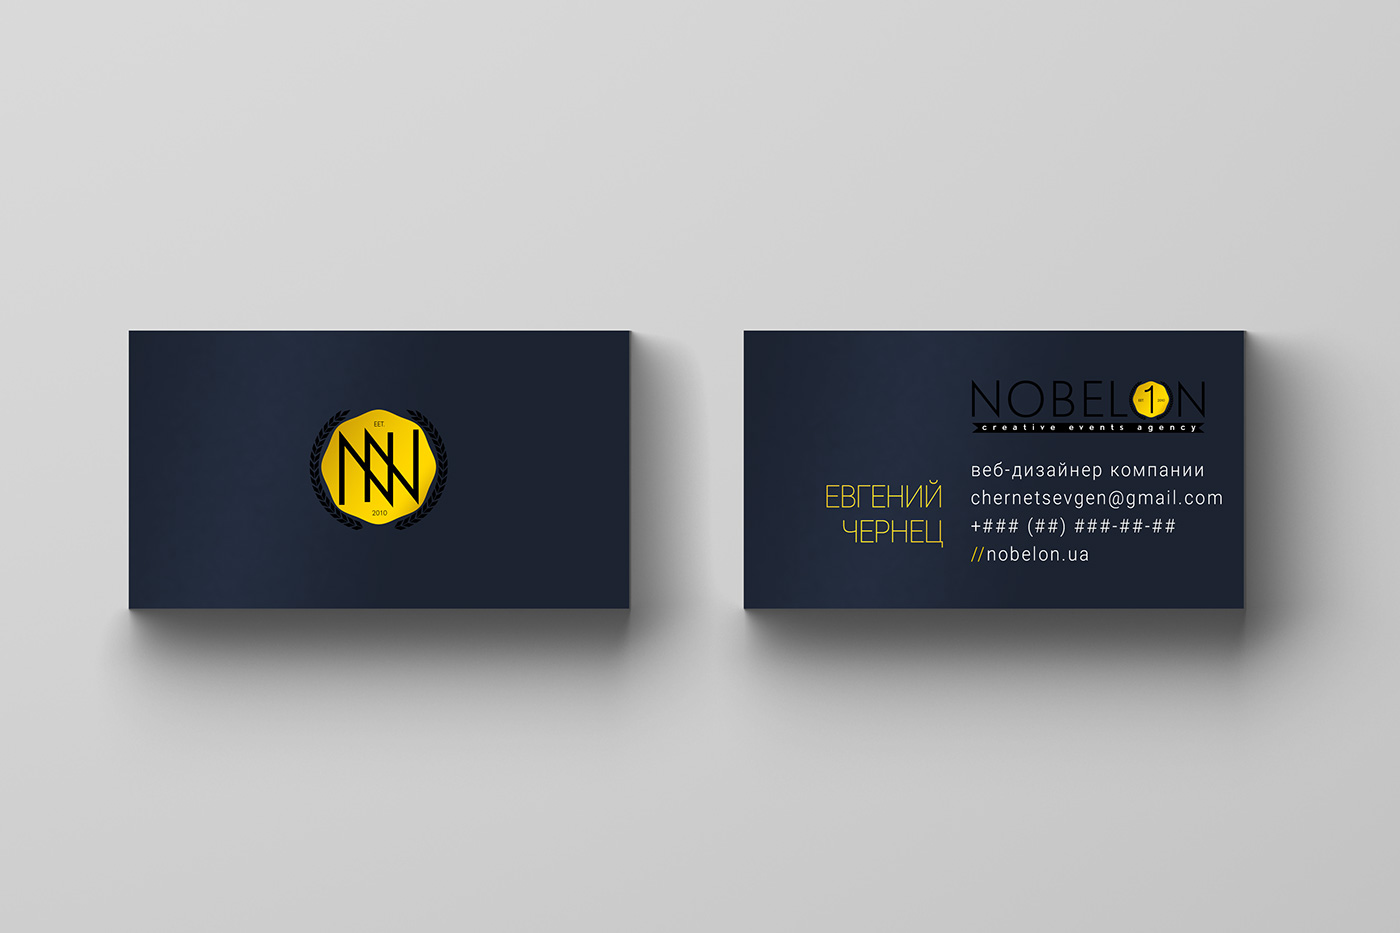 branding  Events creative agency logo Gold Style nobel Chernets Chernets Evgen